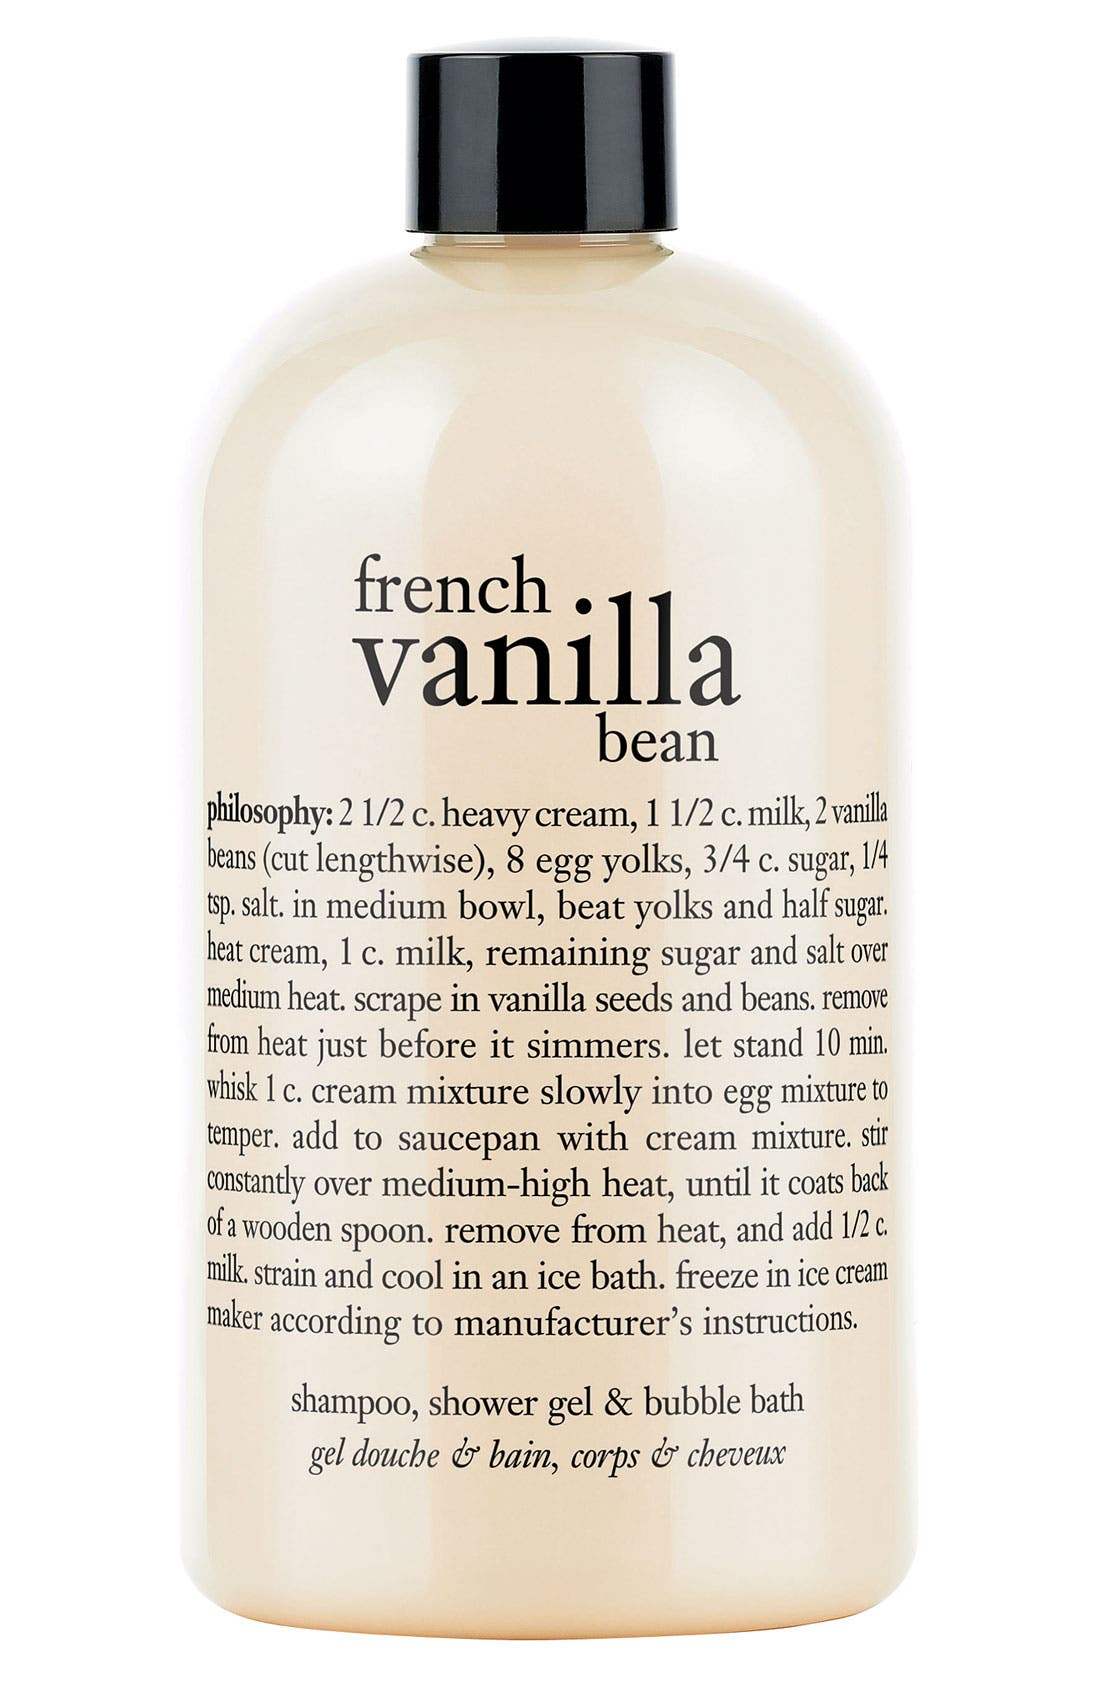 PHILOSOPHY 'french vanilla bean' shampoo, shower gel & bubble bath, Main, color, NO COLOR